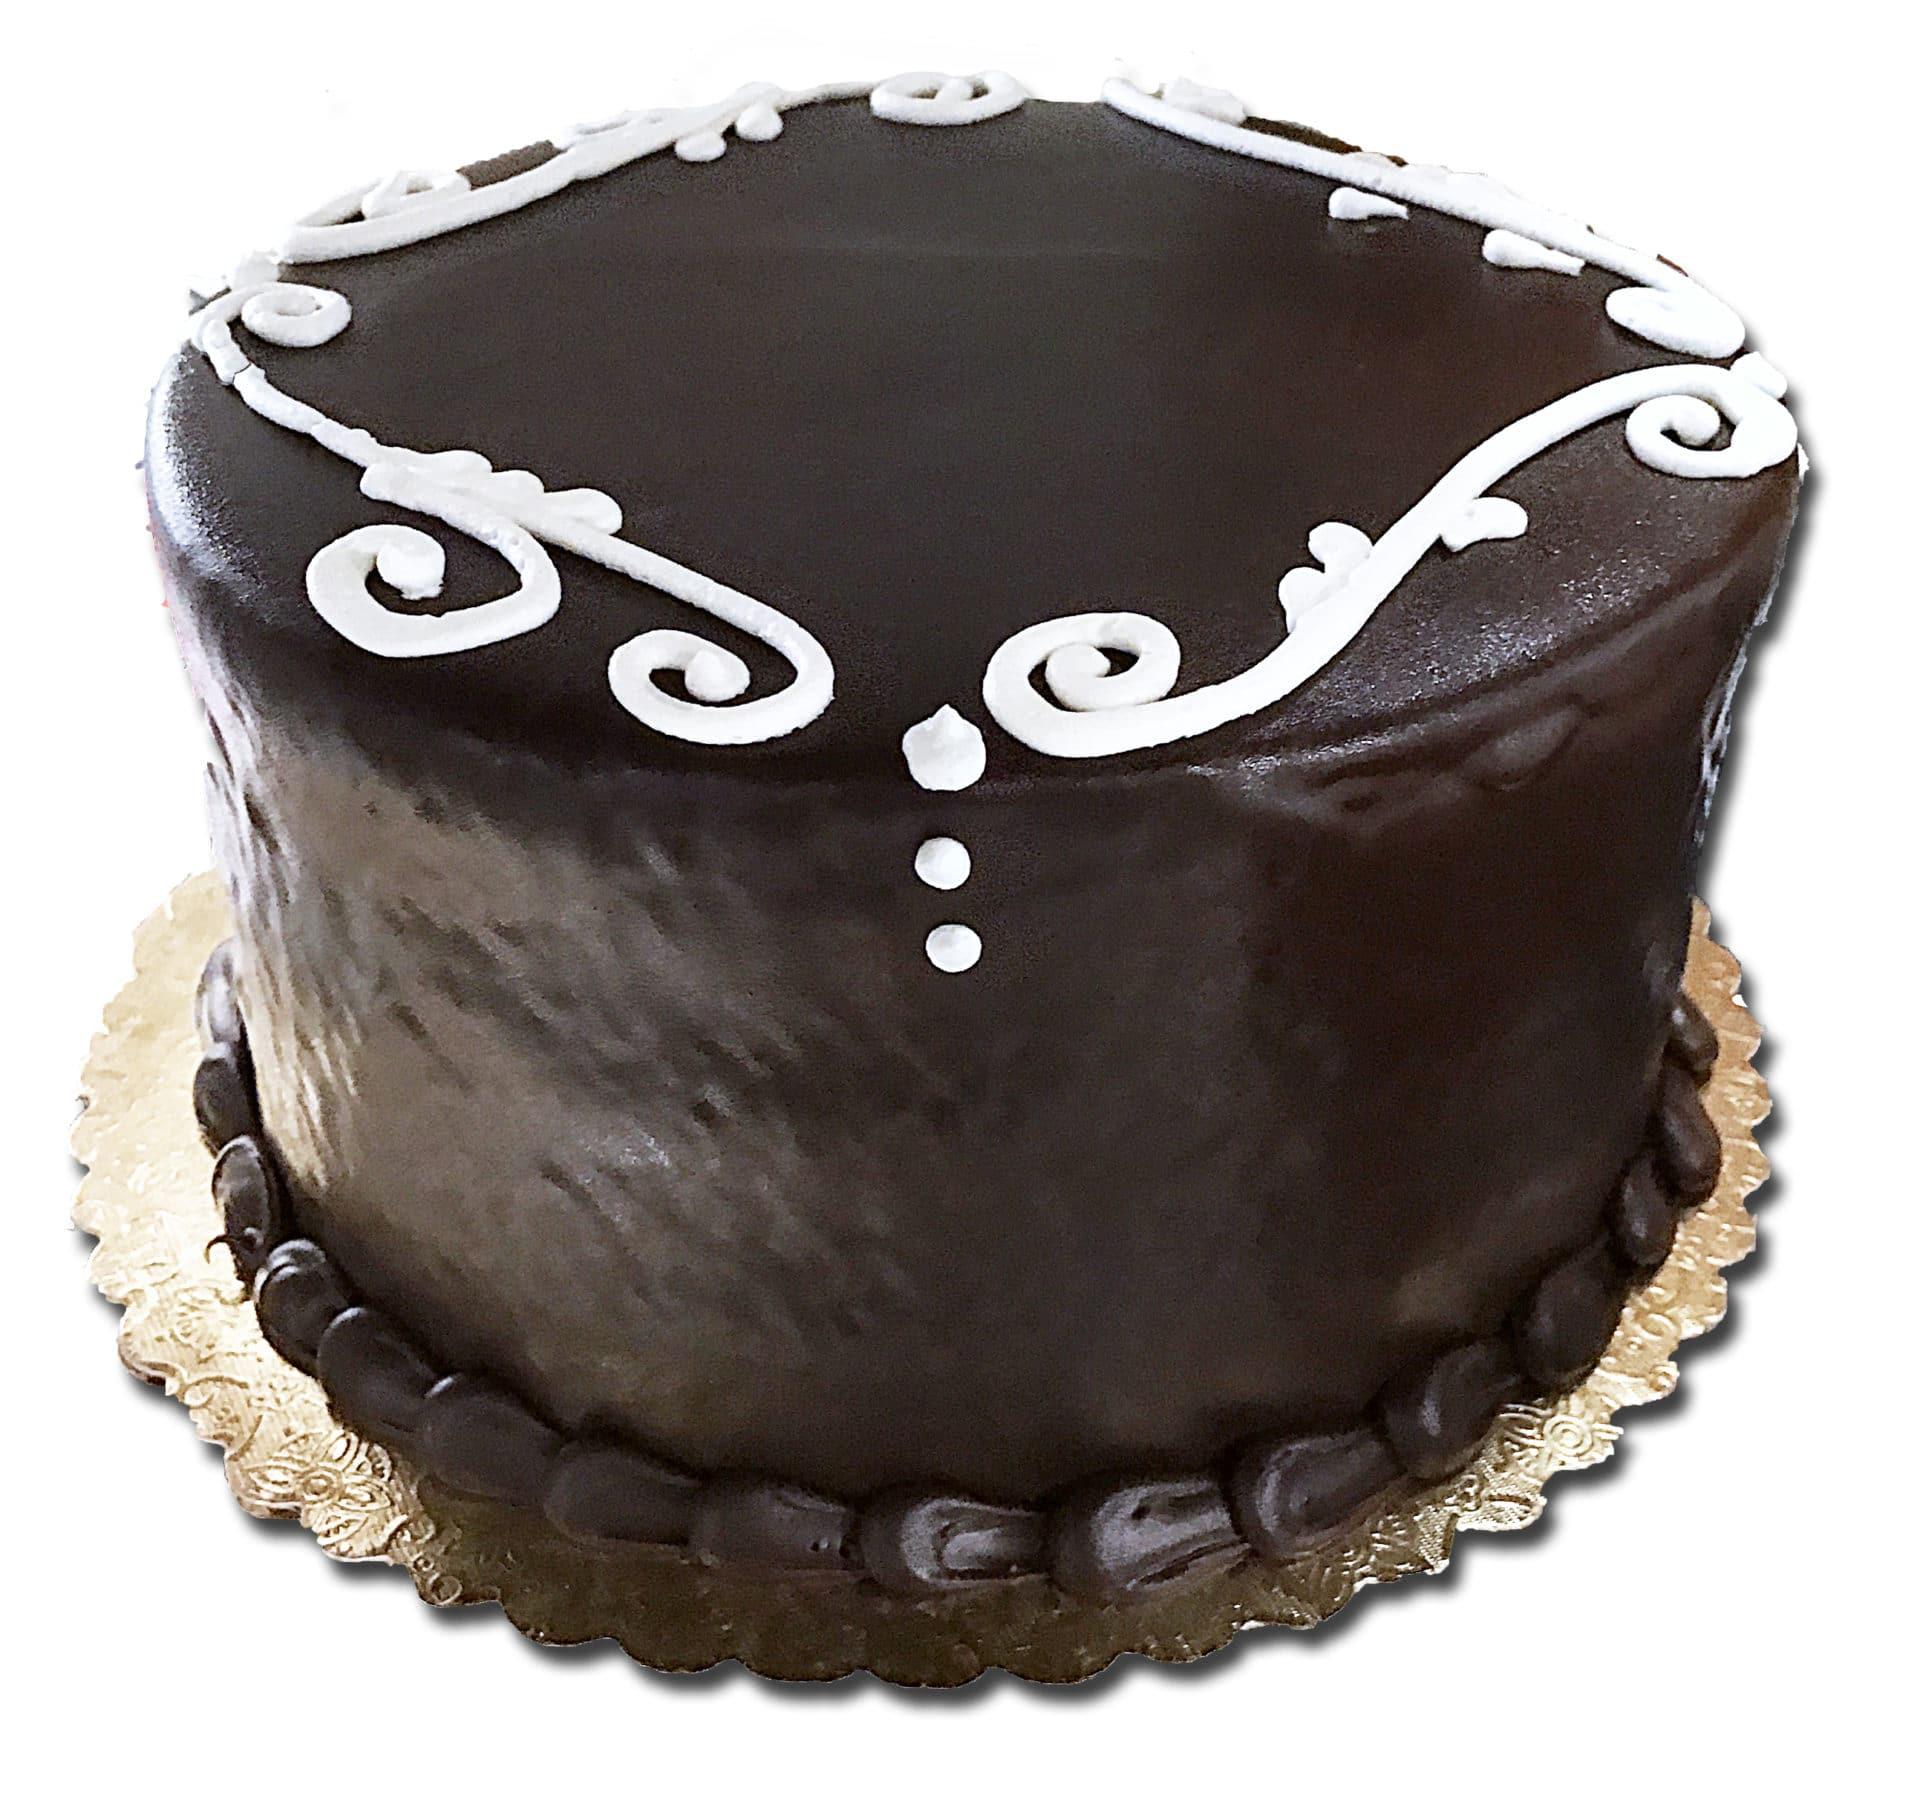 Aggies Tuxedo French Cream Torte